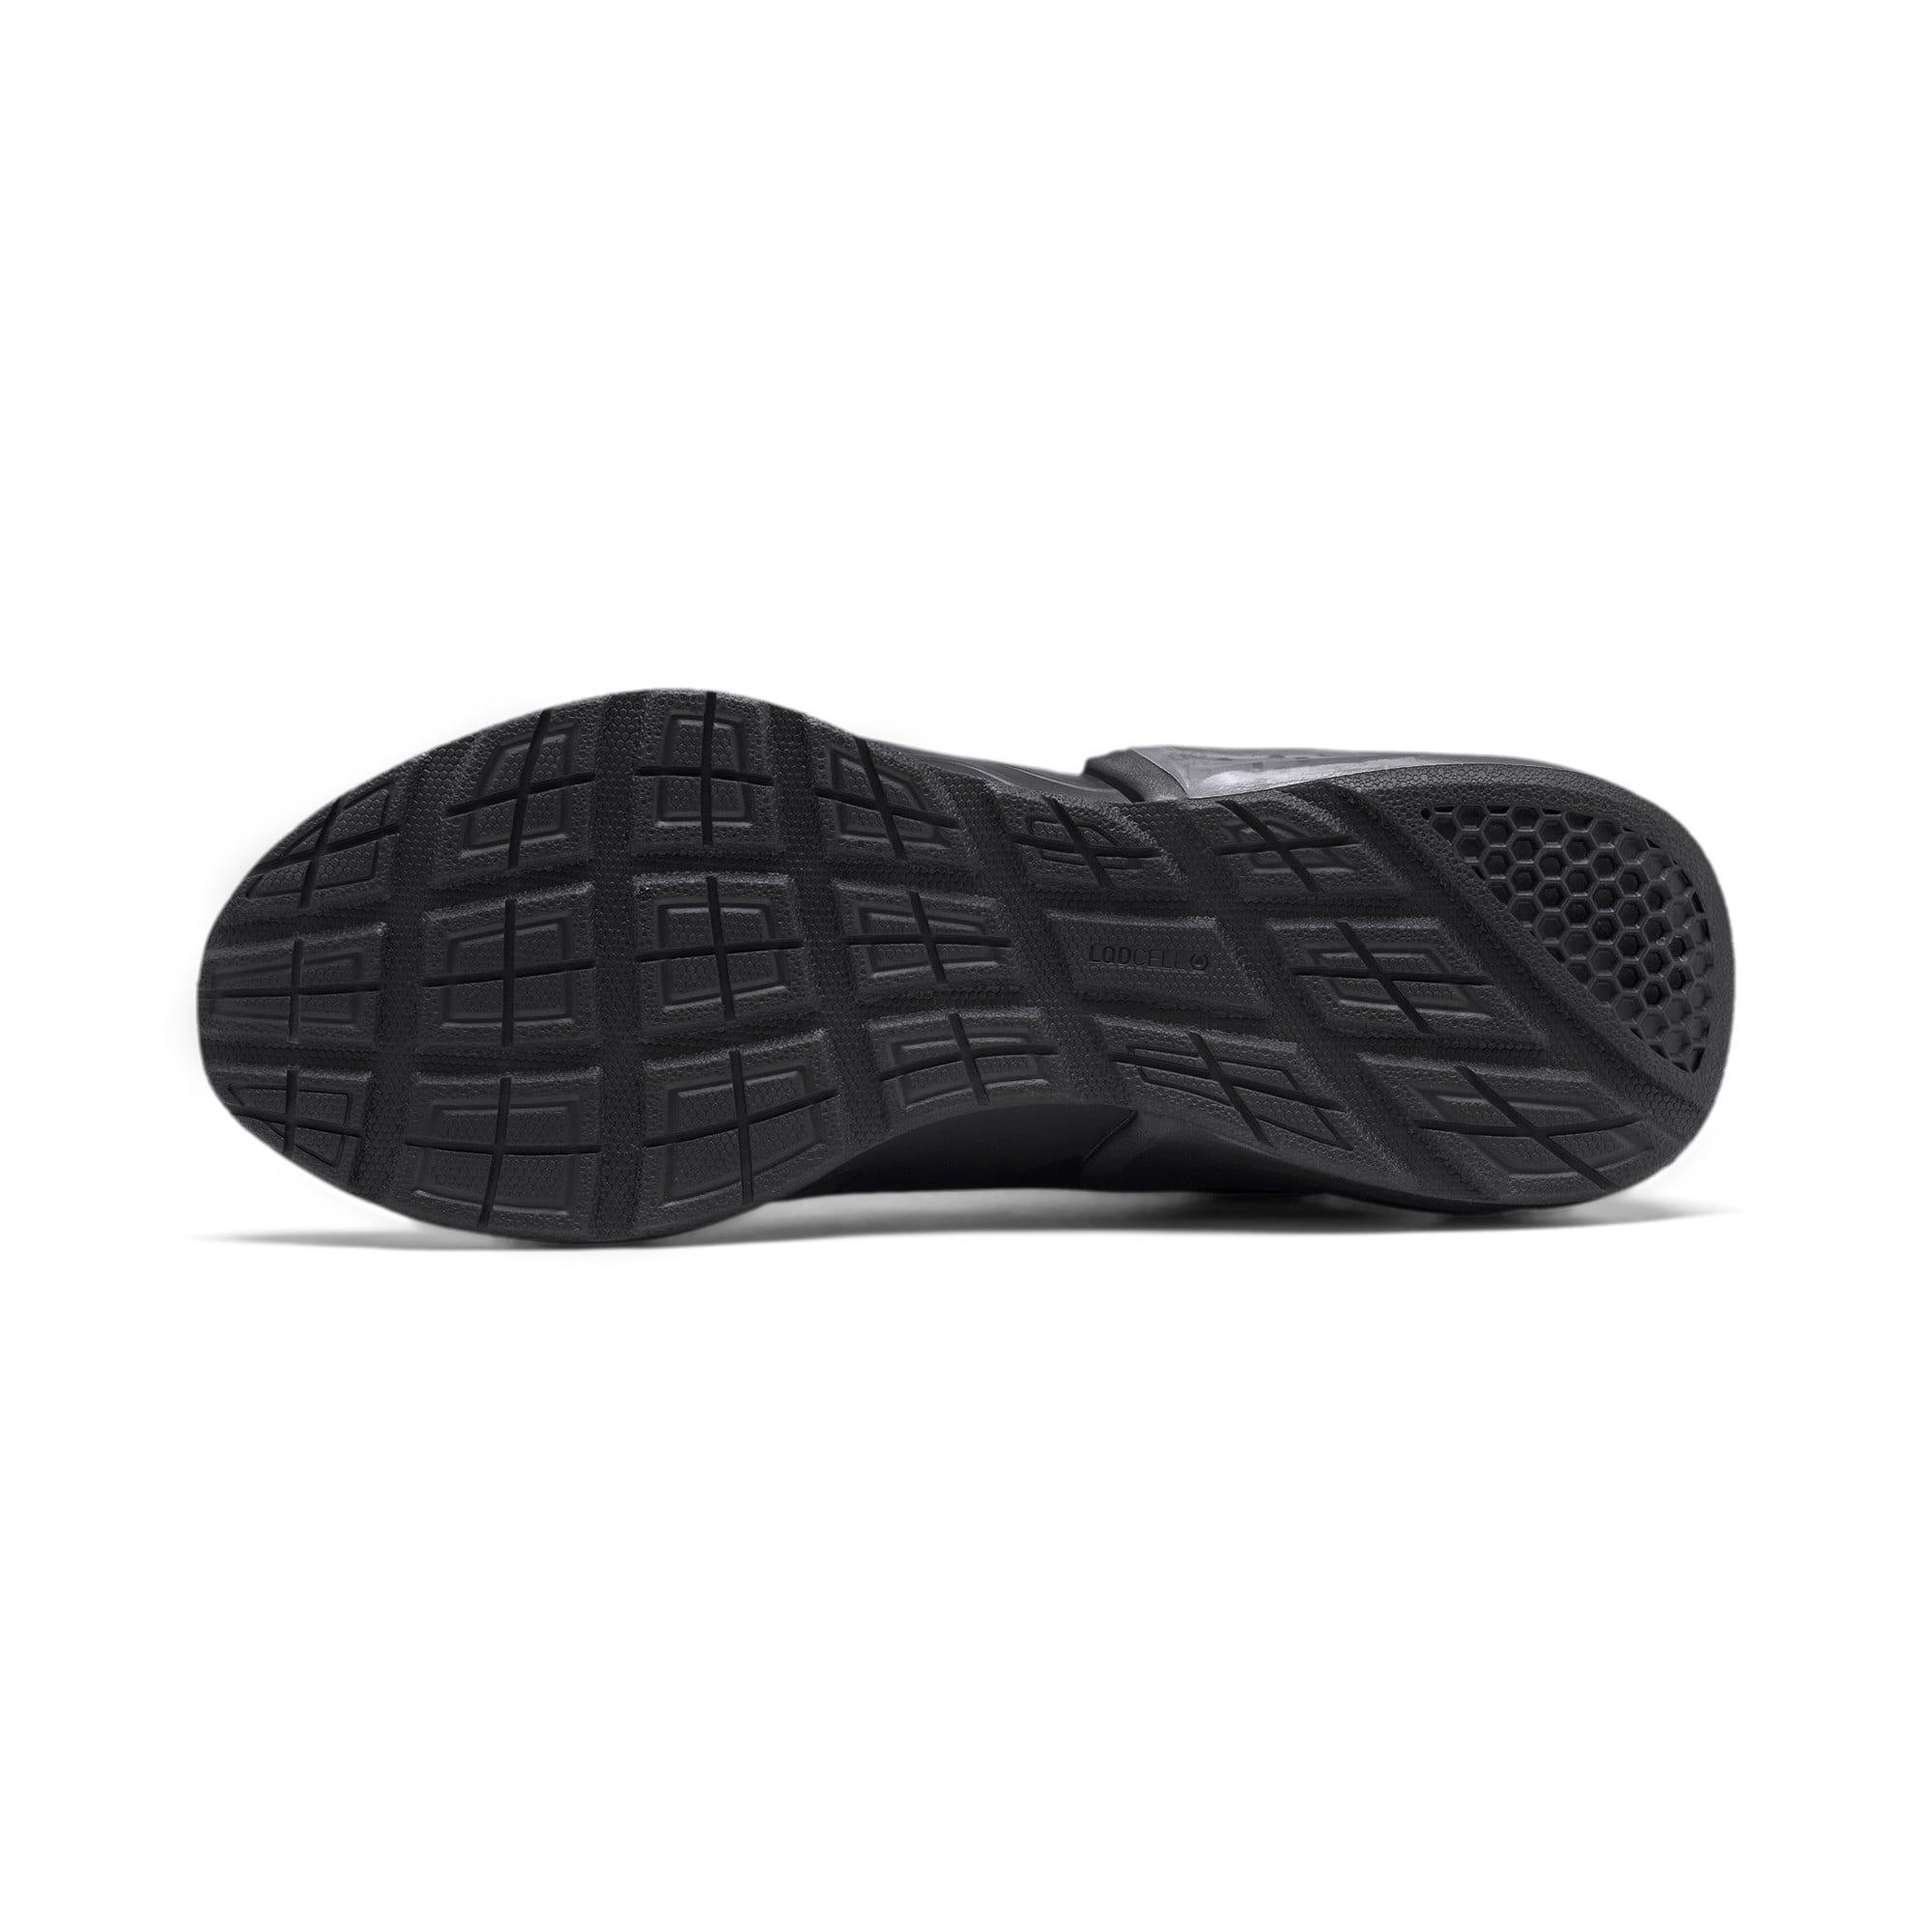 Thumbnail 5 of LQDCELL Challenge Perf Men's Training Shoes, Puma Black-CASTLEROCK, medium